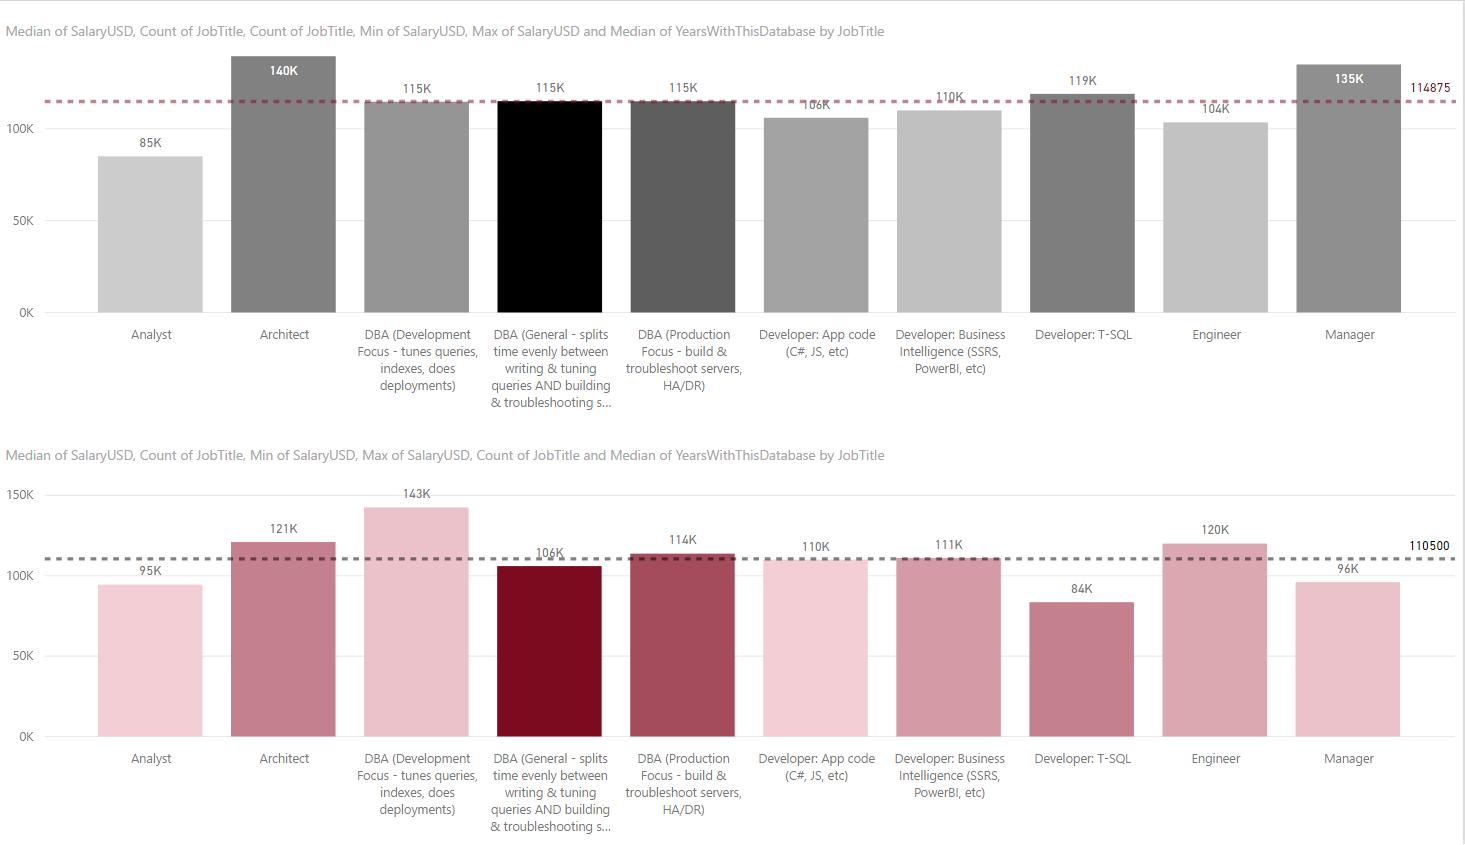 Median Salaries for SeniorPlus (Male $114,875 vs. Female $110,500)